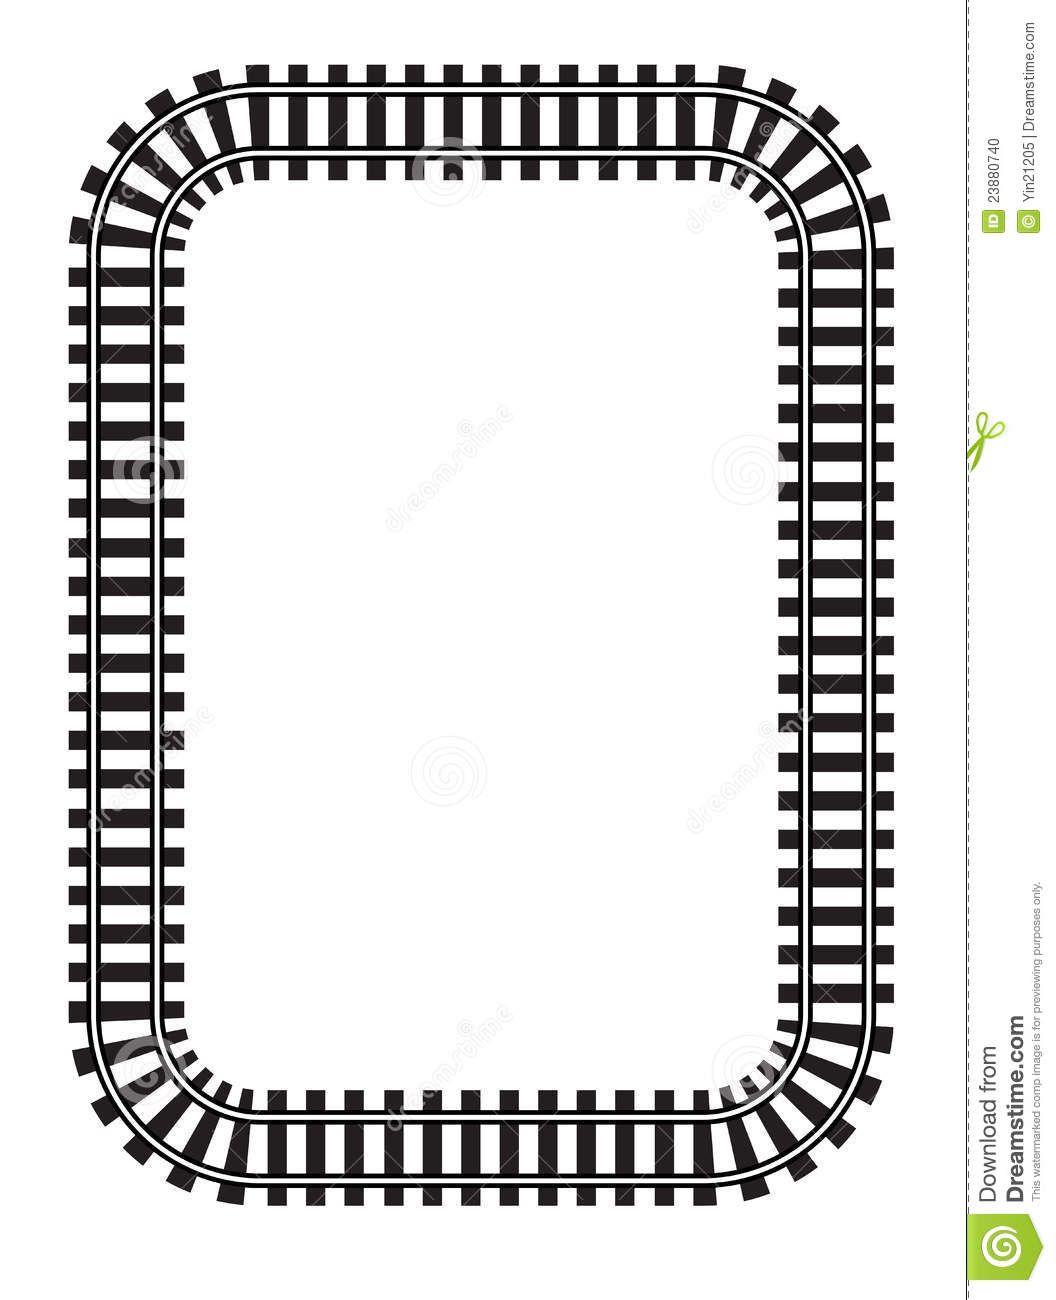 train track clipart google search [ 1056 x 1300 Pixel ]